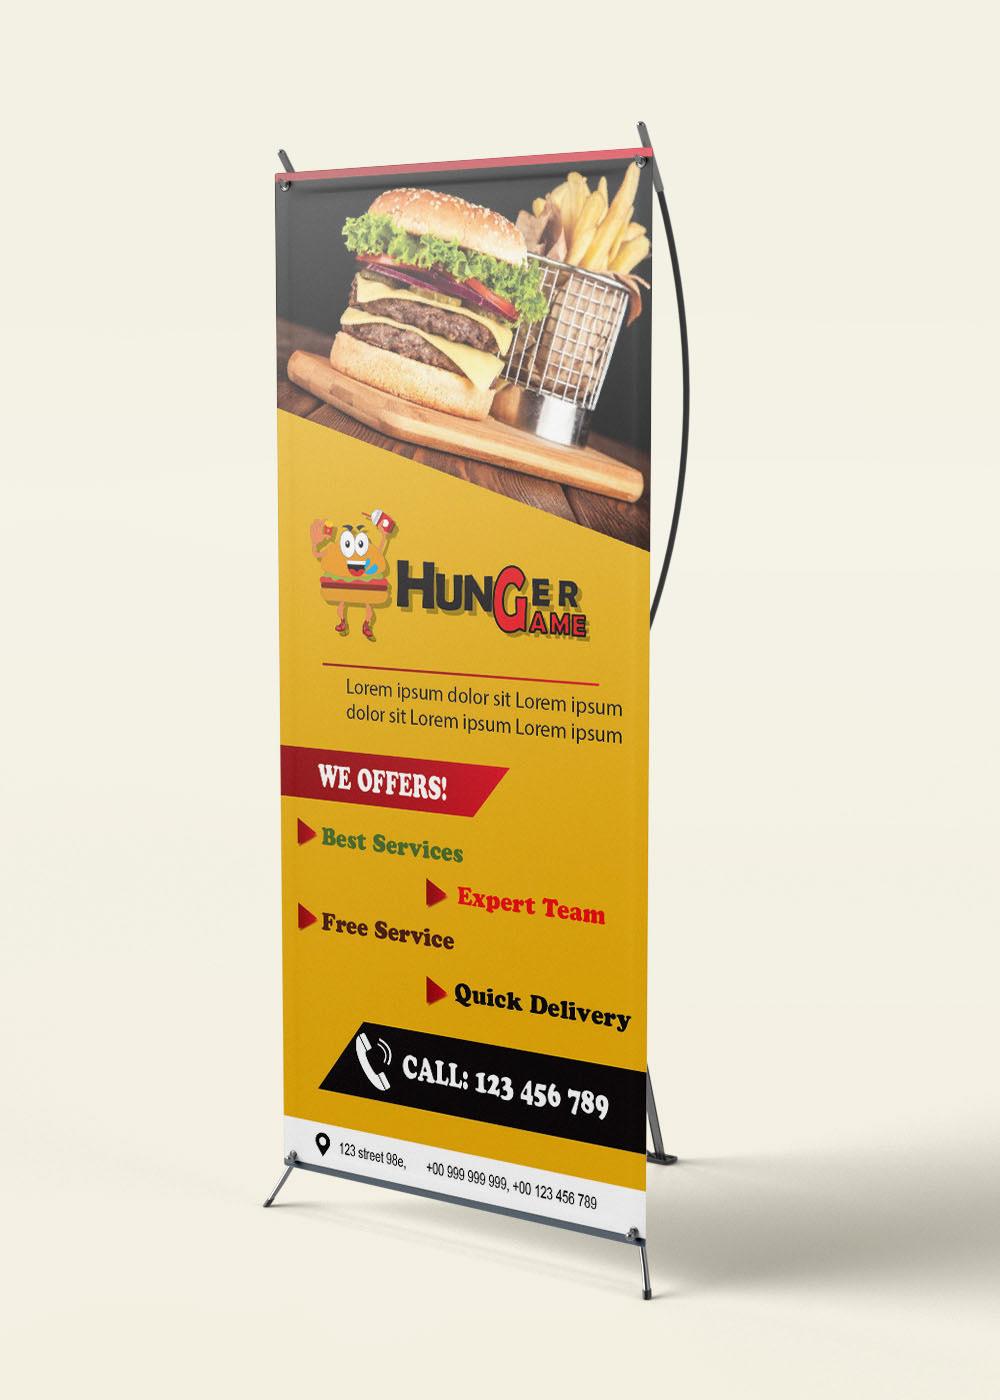 Image may contain: fast food, menu and food